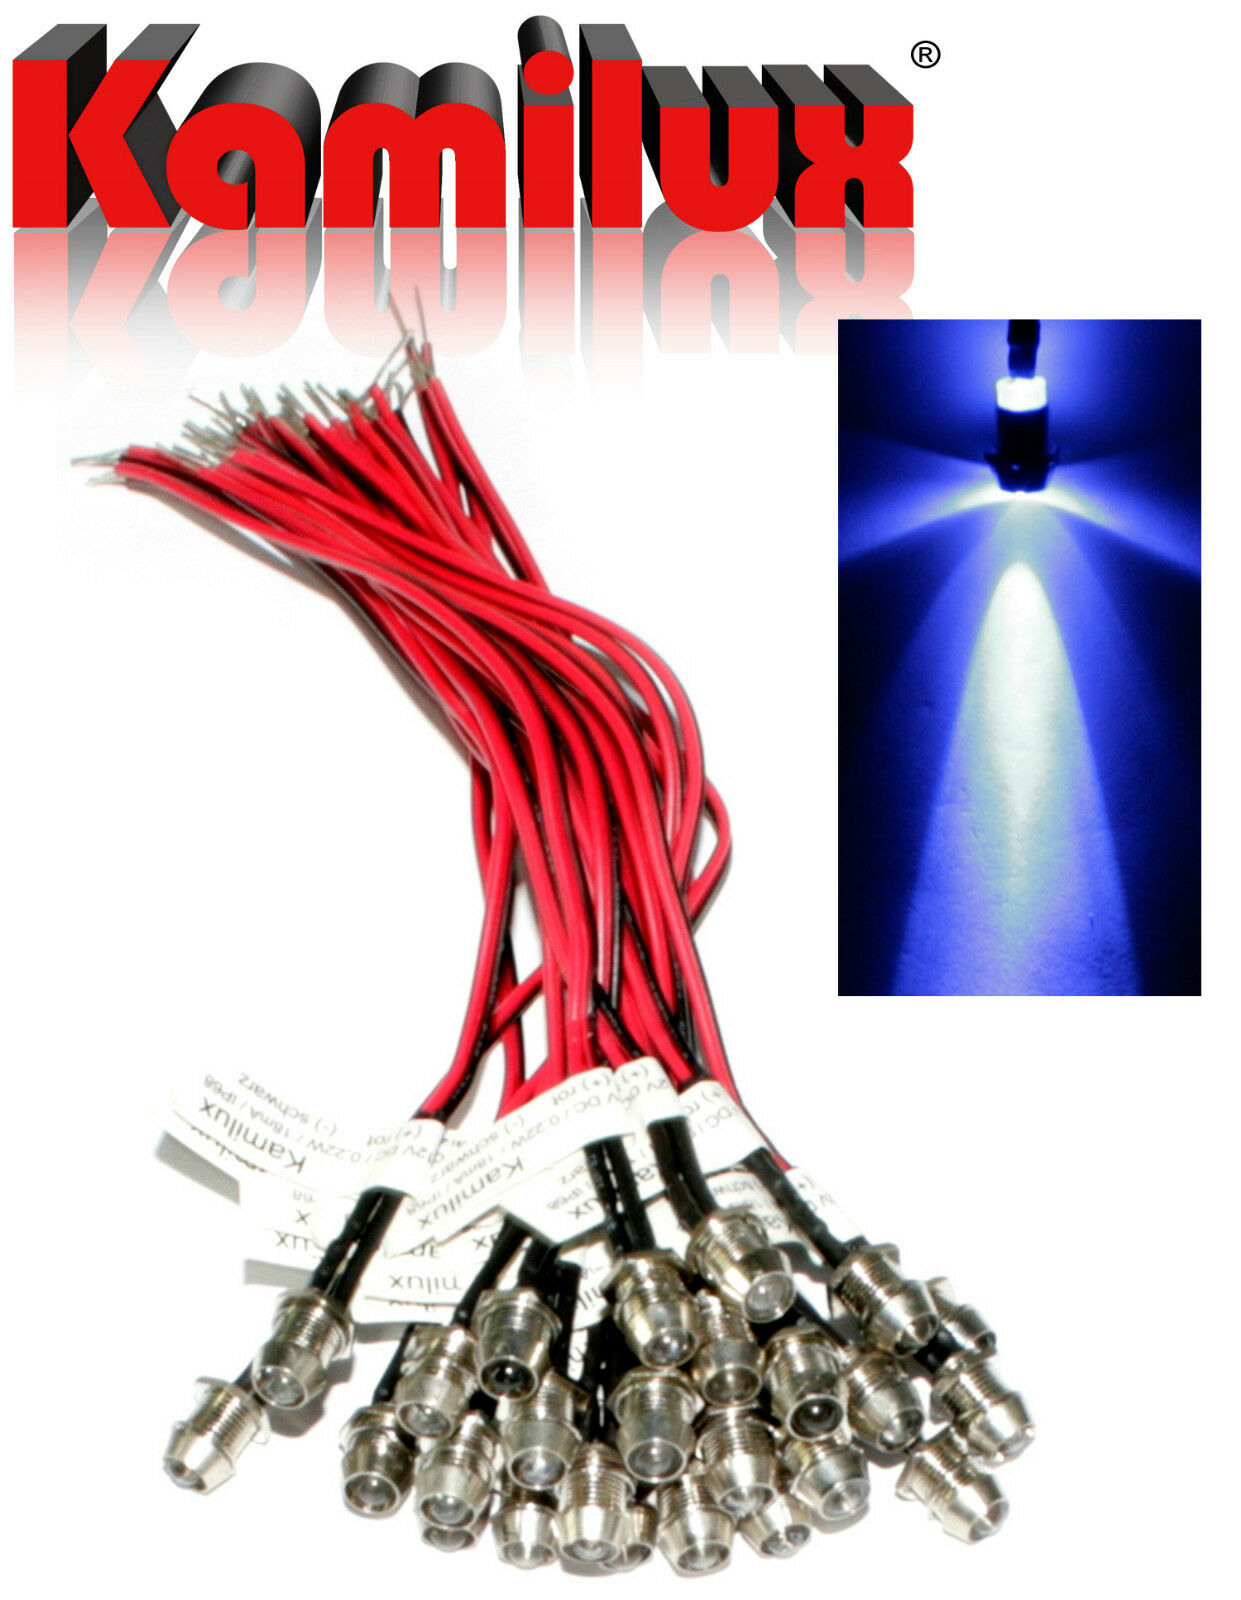 100x 100x 100x acero inoxidable mini-emisor de luz LED puntos 12v ip68 estrellas cielo & dispositivos de red b77113